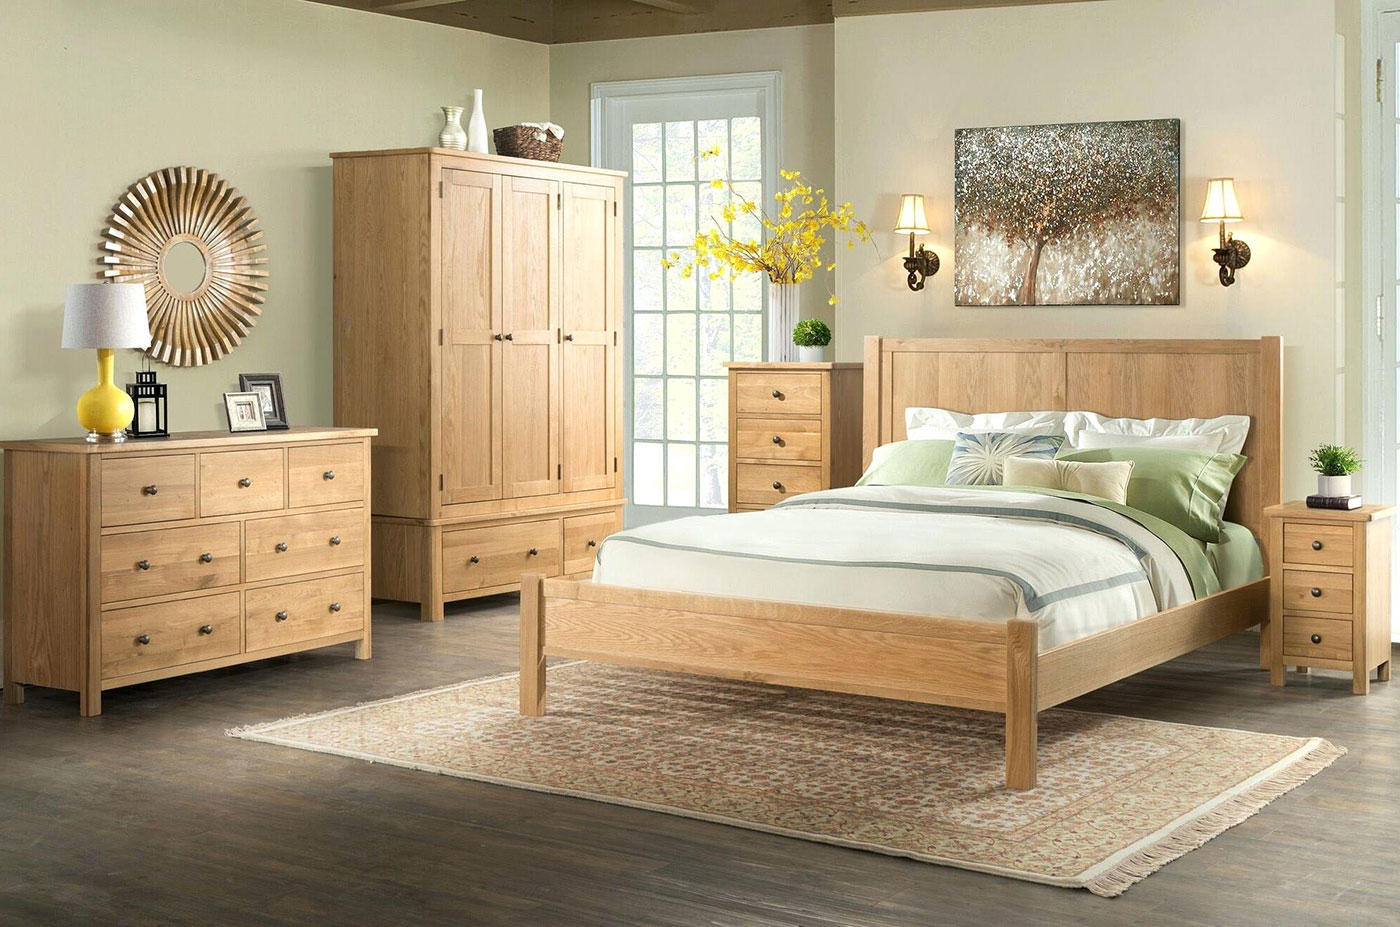 Bright bedroom furniture